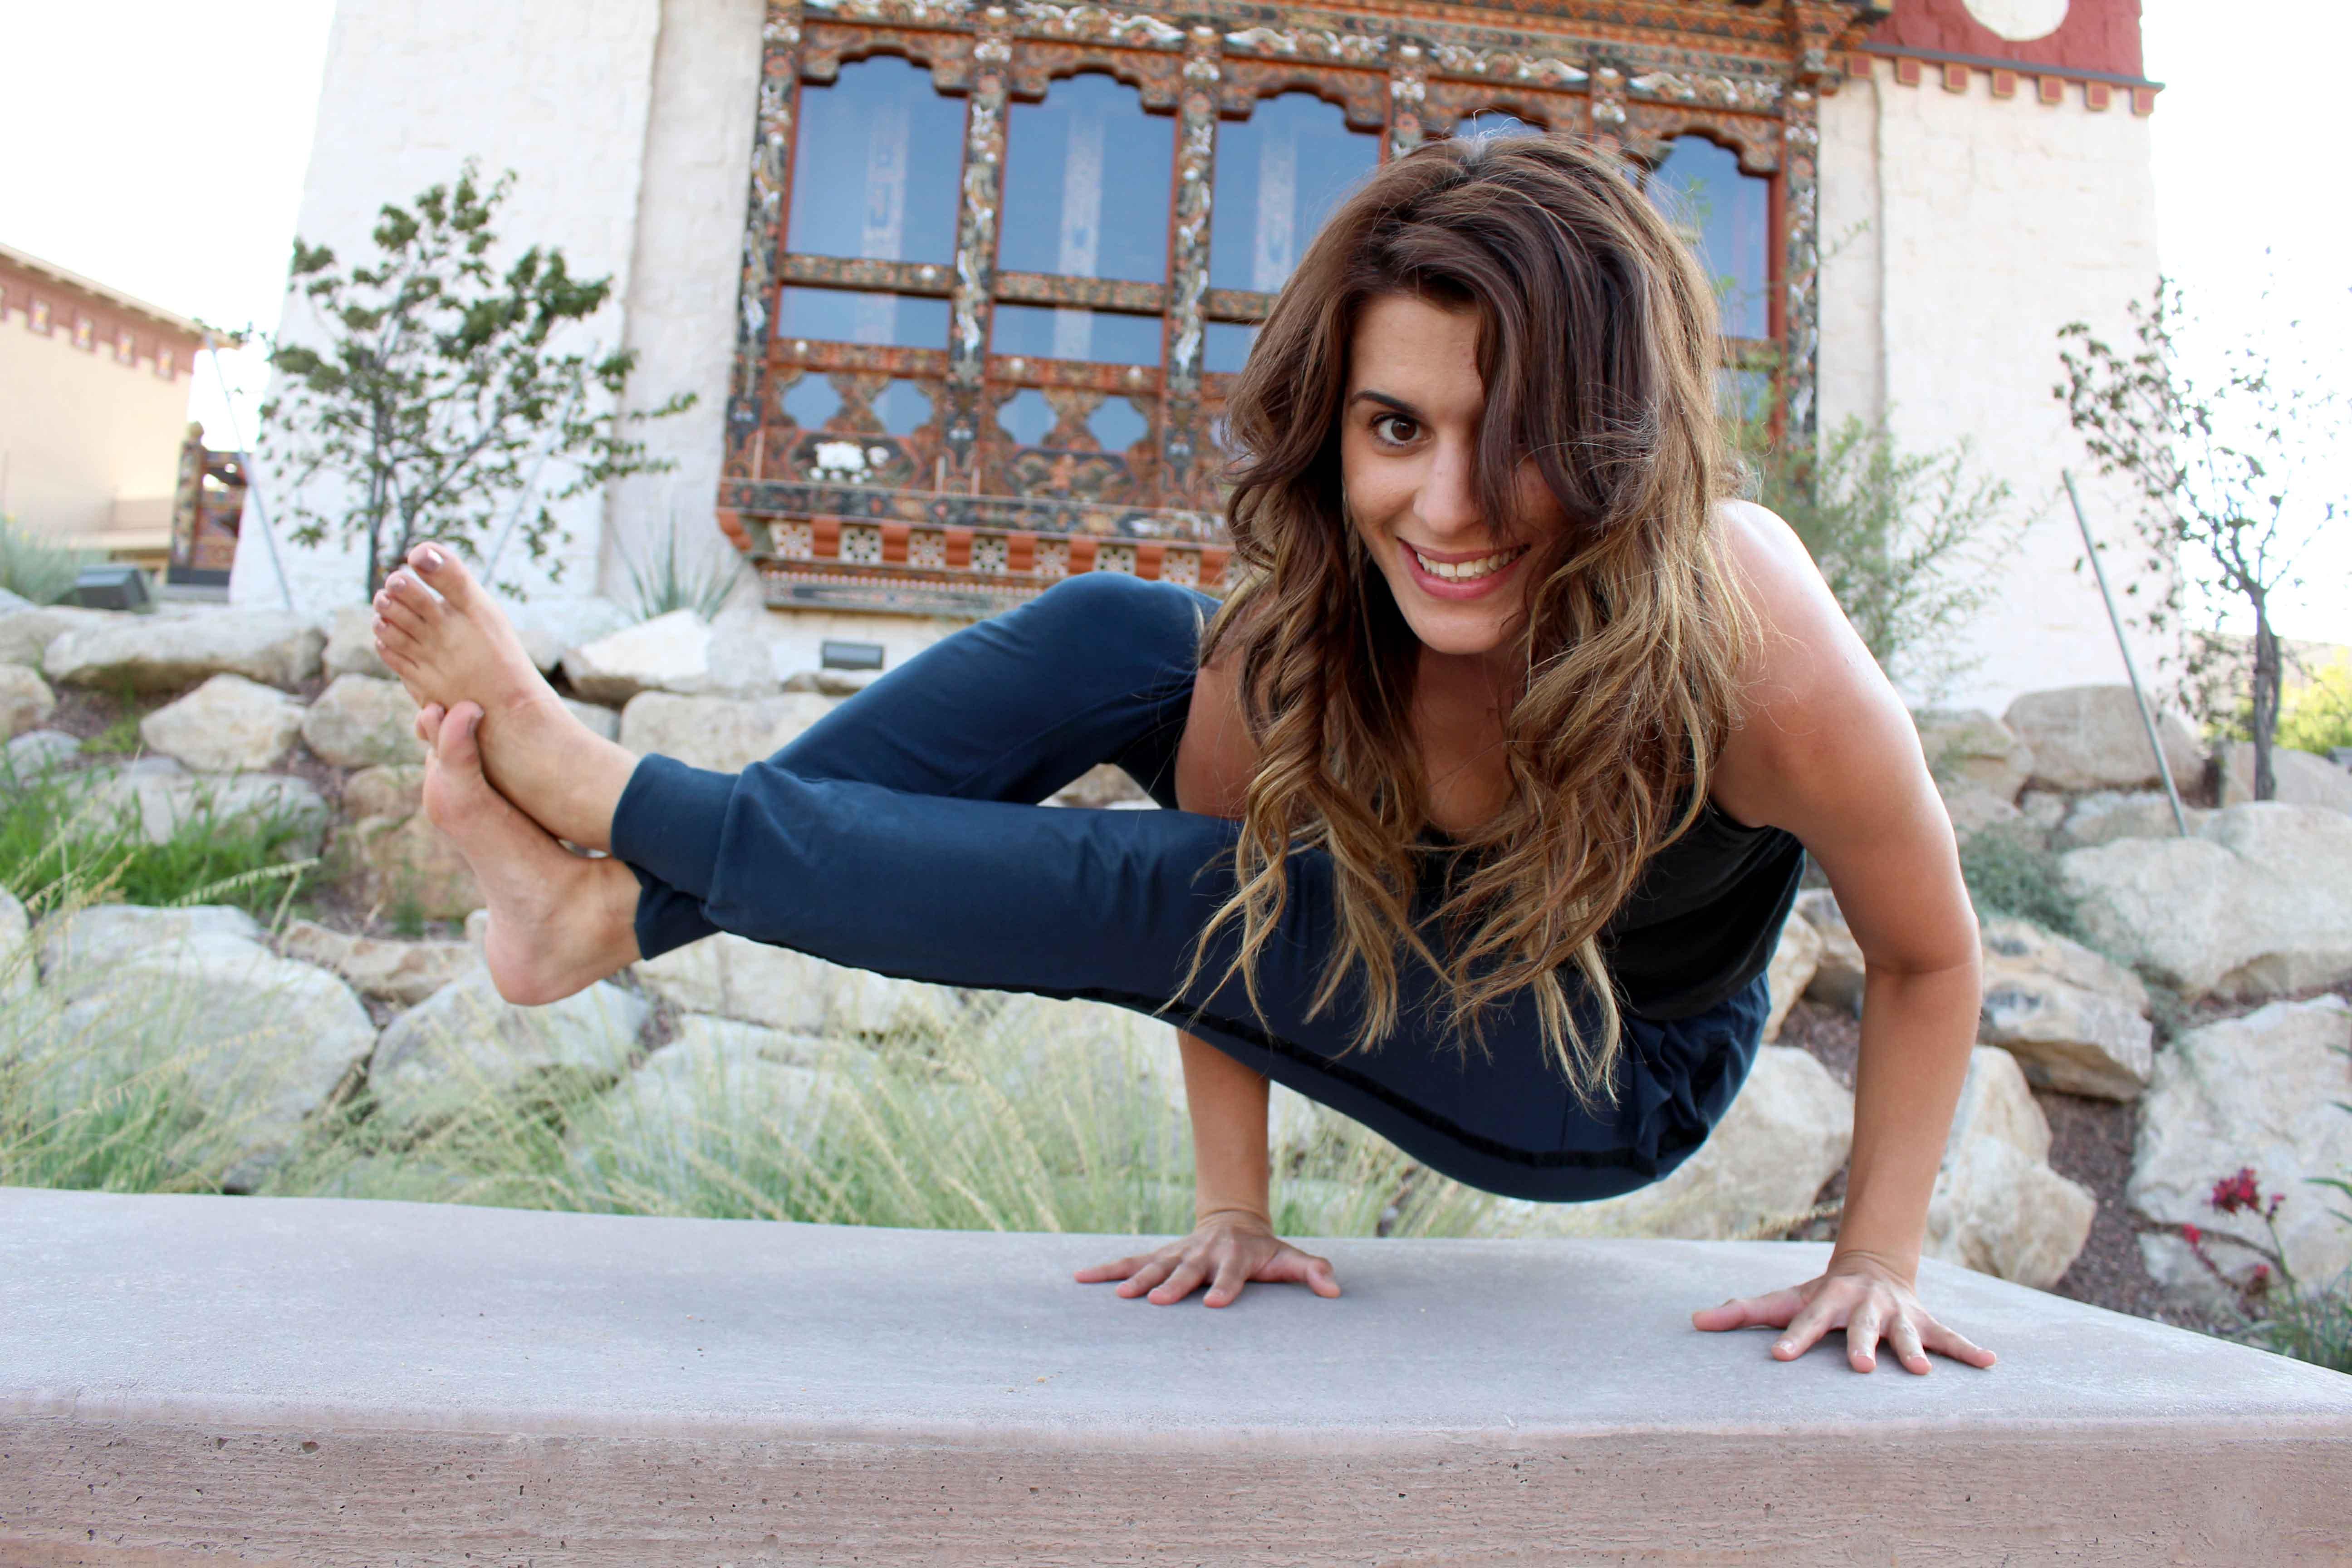 Education graduate student, Rasmiyeh Asam demonstrates one of the yoga poses she teaches.